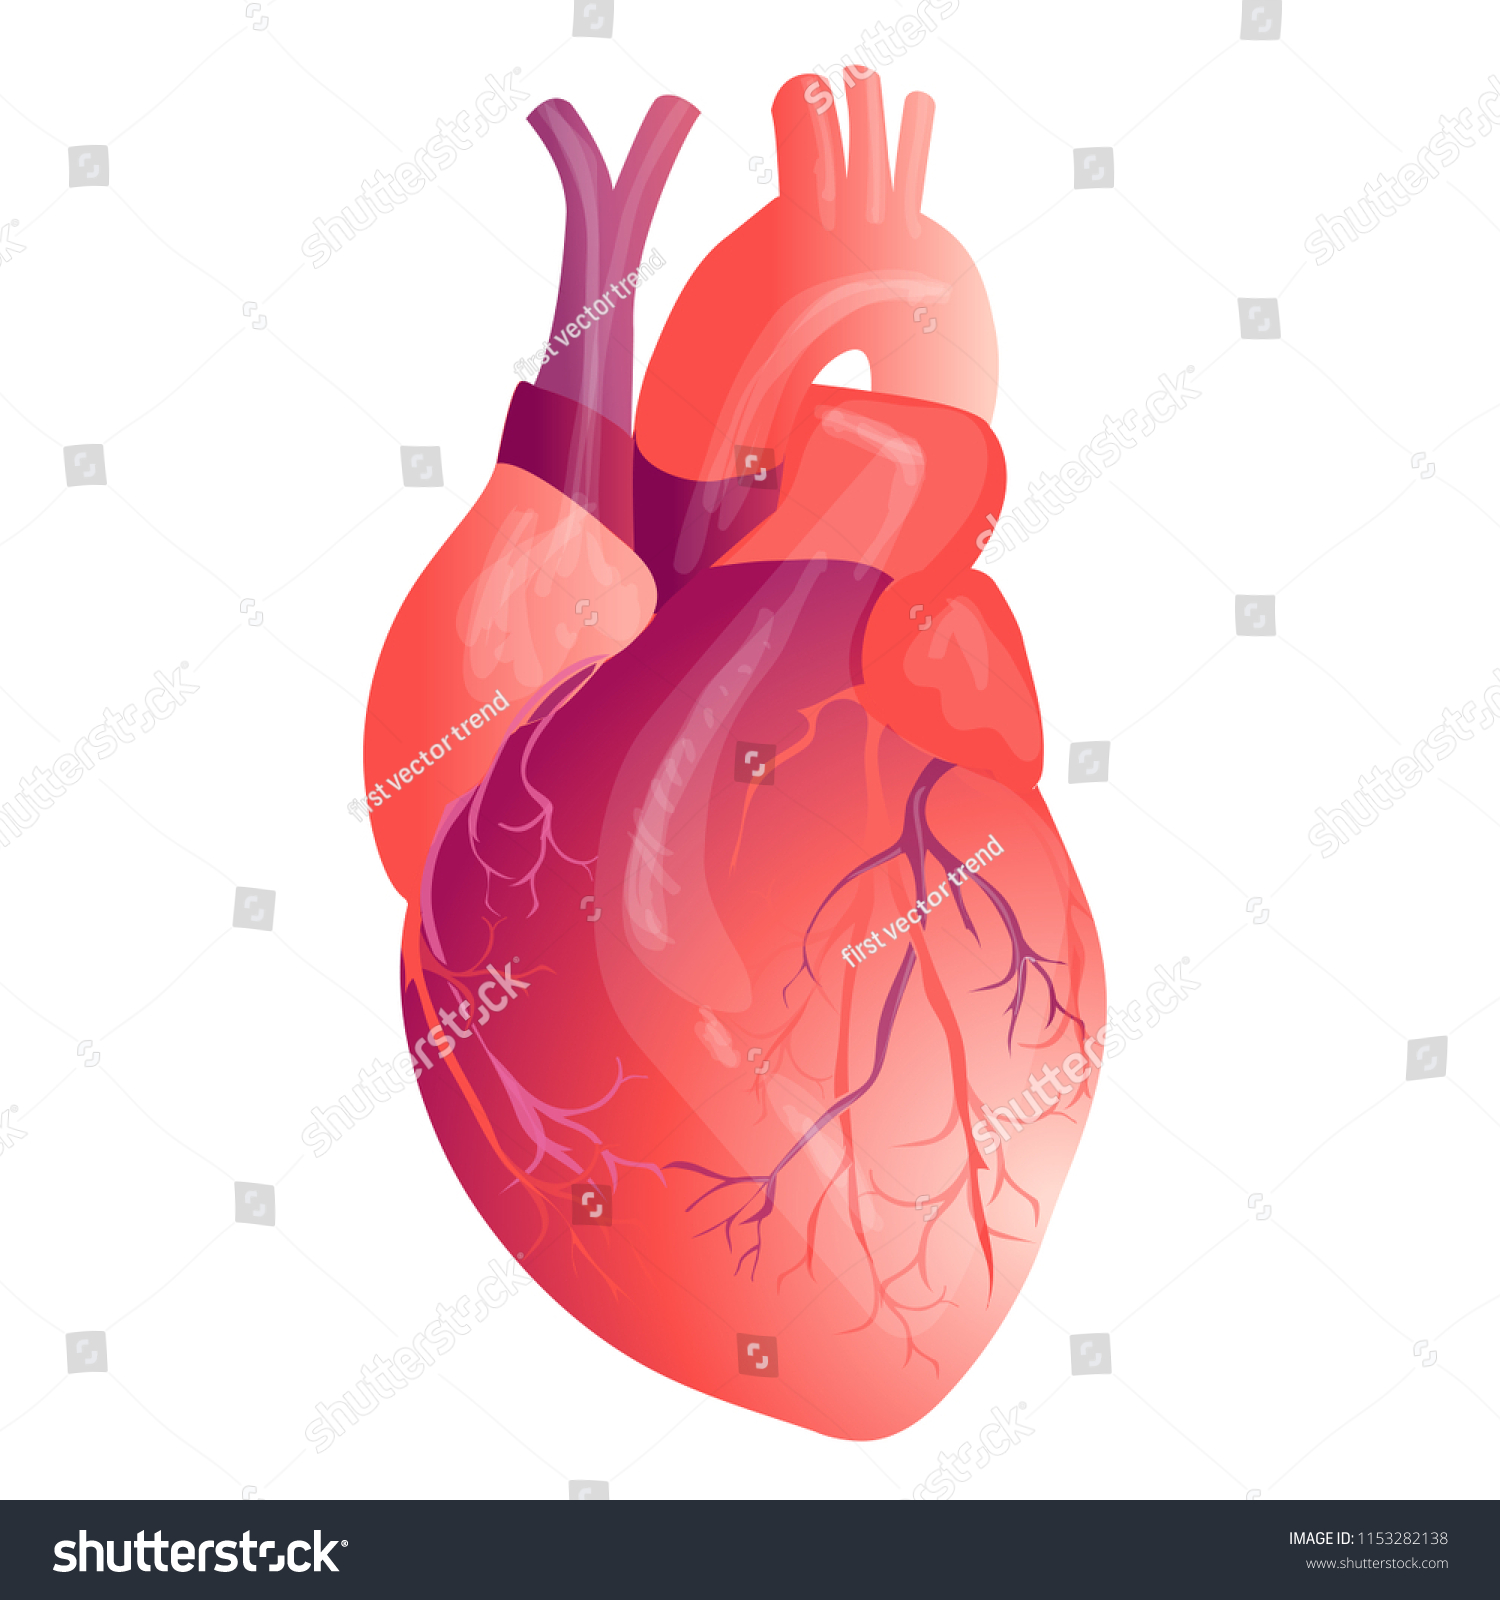 Royalty Free Stock Illustration Of Realistic Human Heart Internal